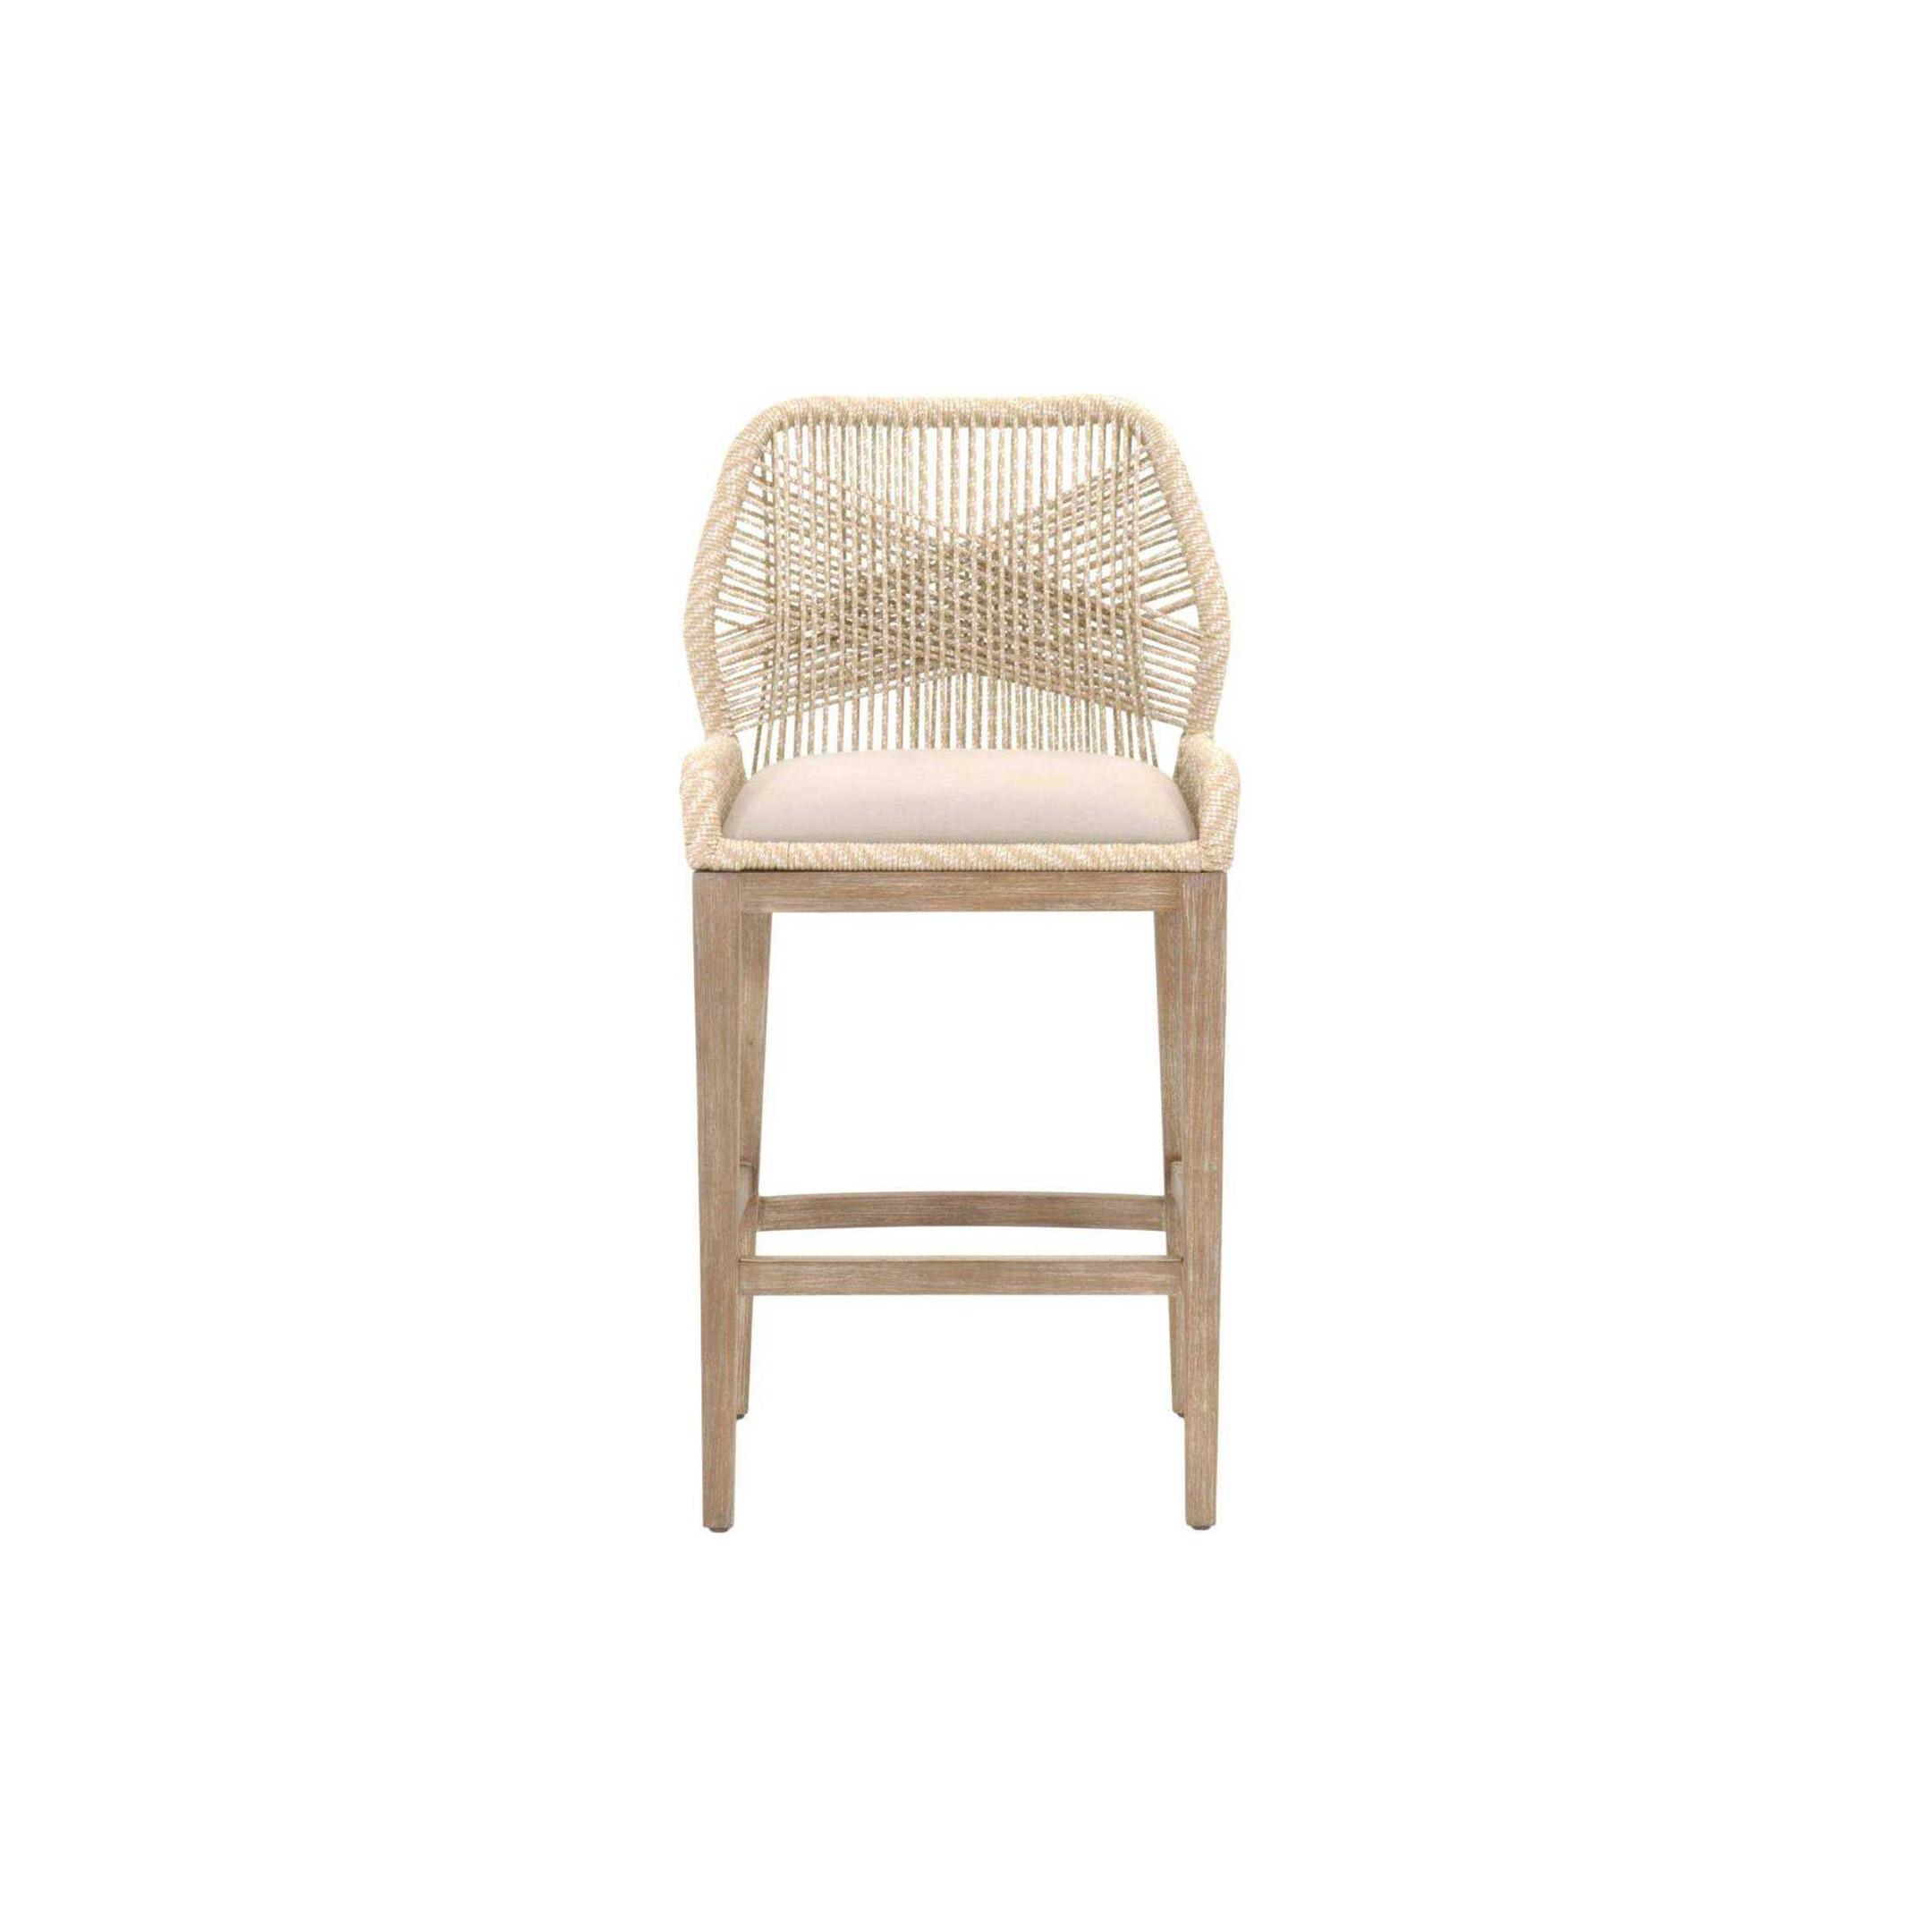 woven stool.jpg